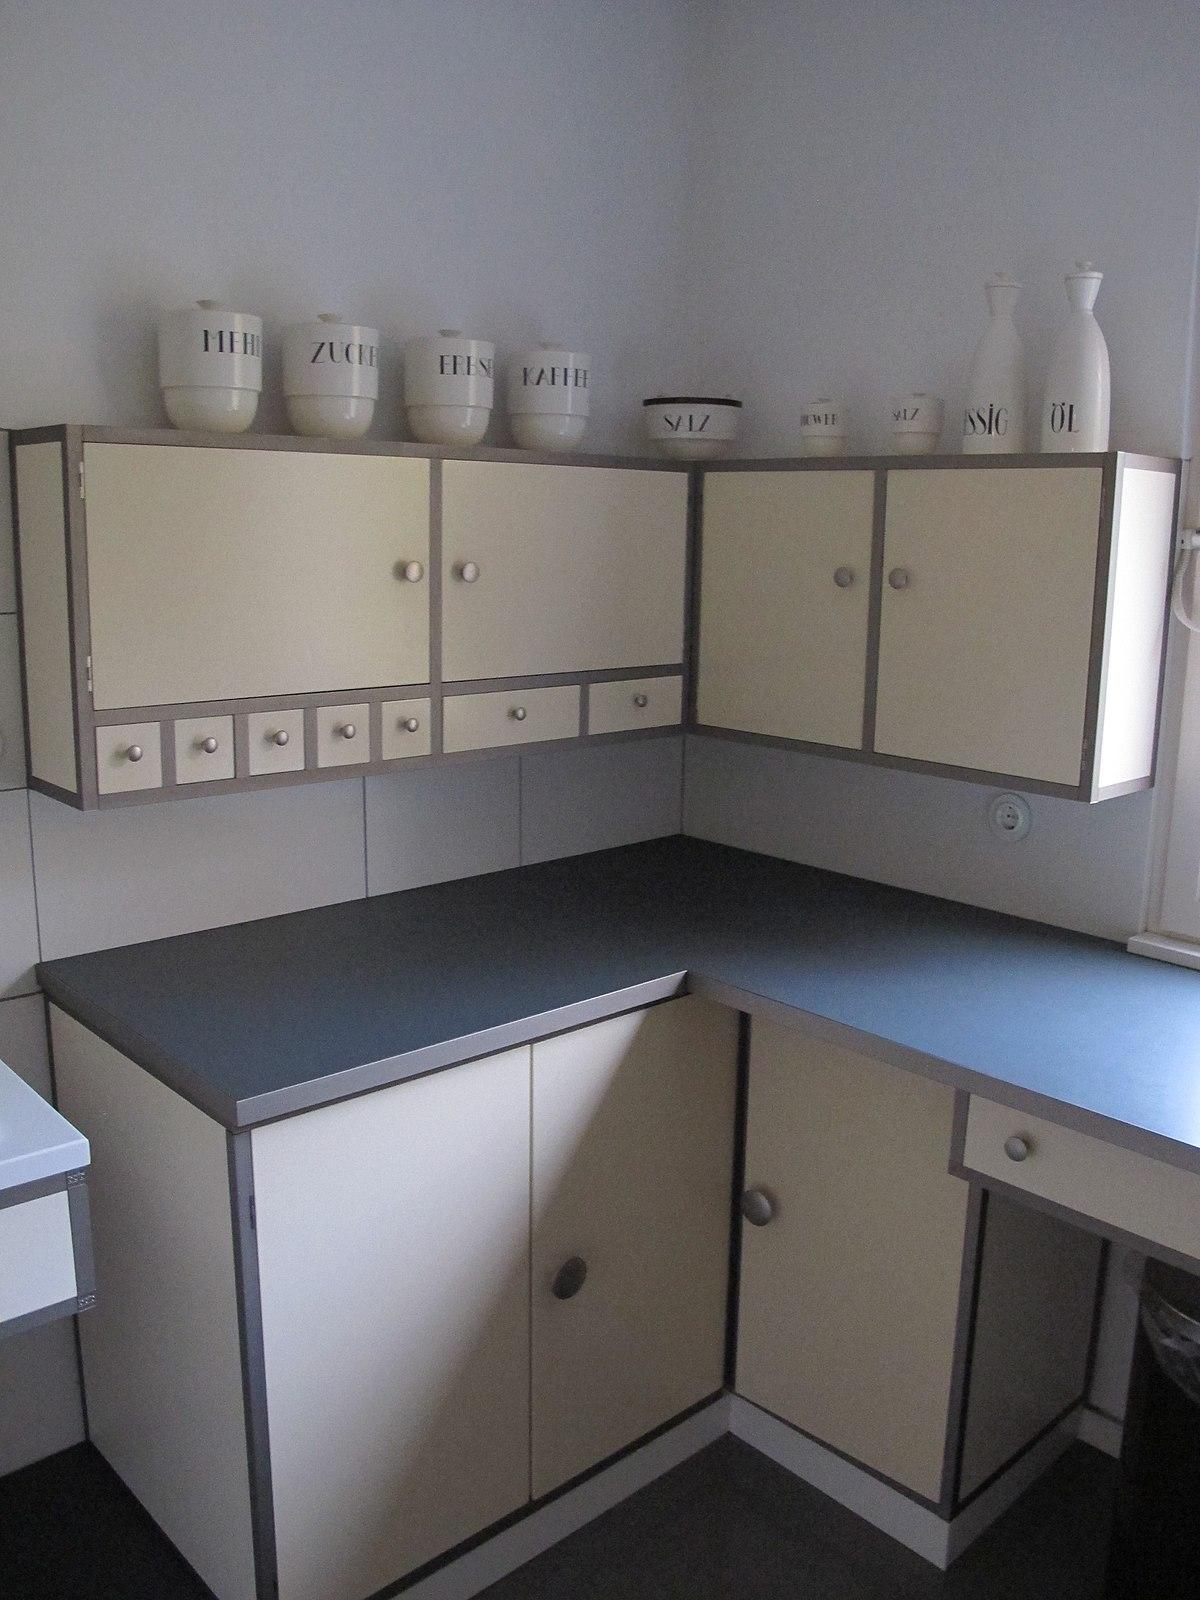 benita koch otte wikipedia. Black Bedroom Furniture Sets. Home Design Ideas